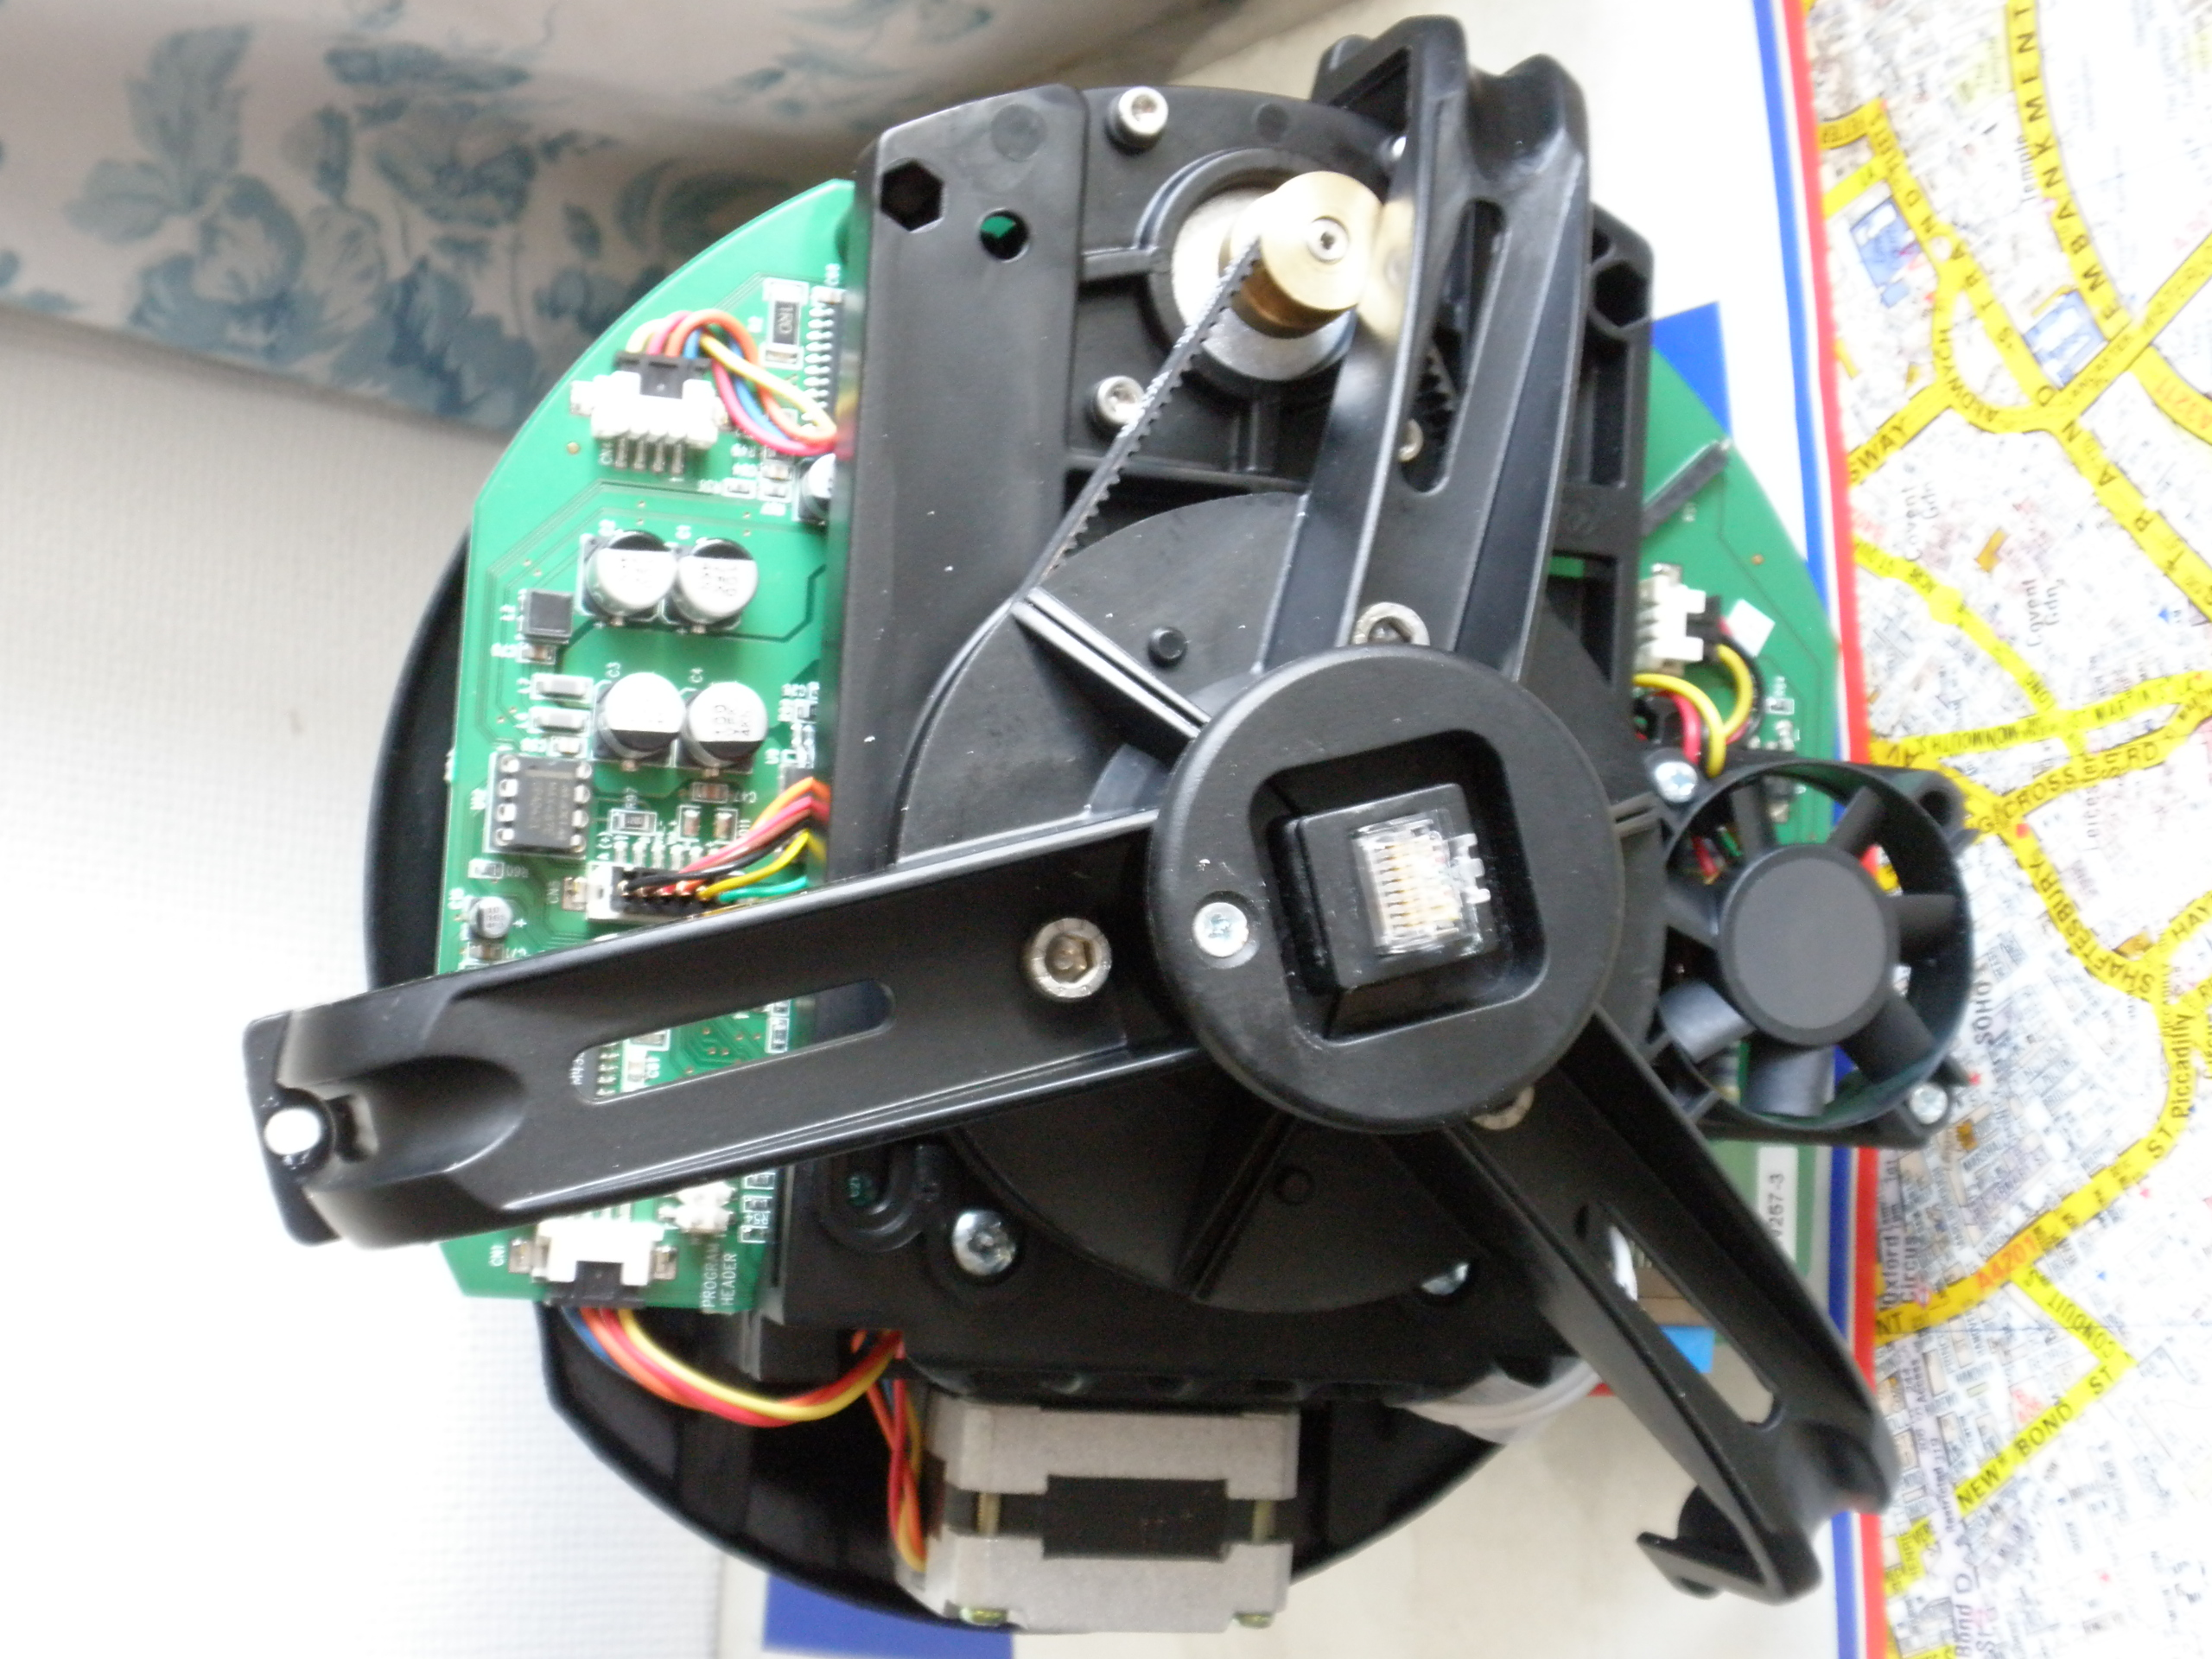 kamera ptz solaris d07-rxe pod��czenie